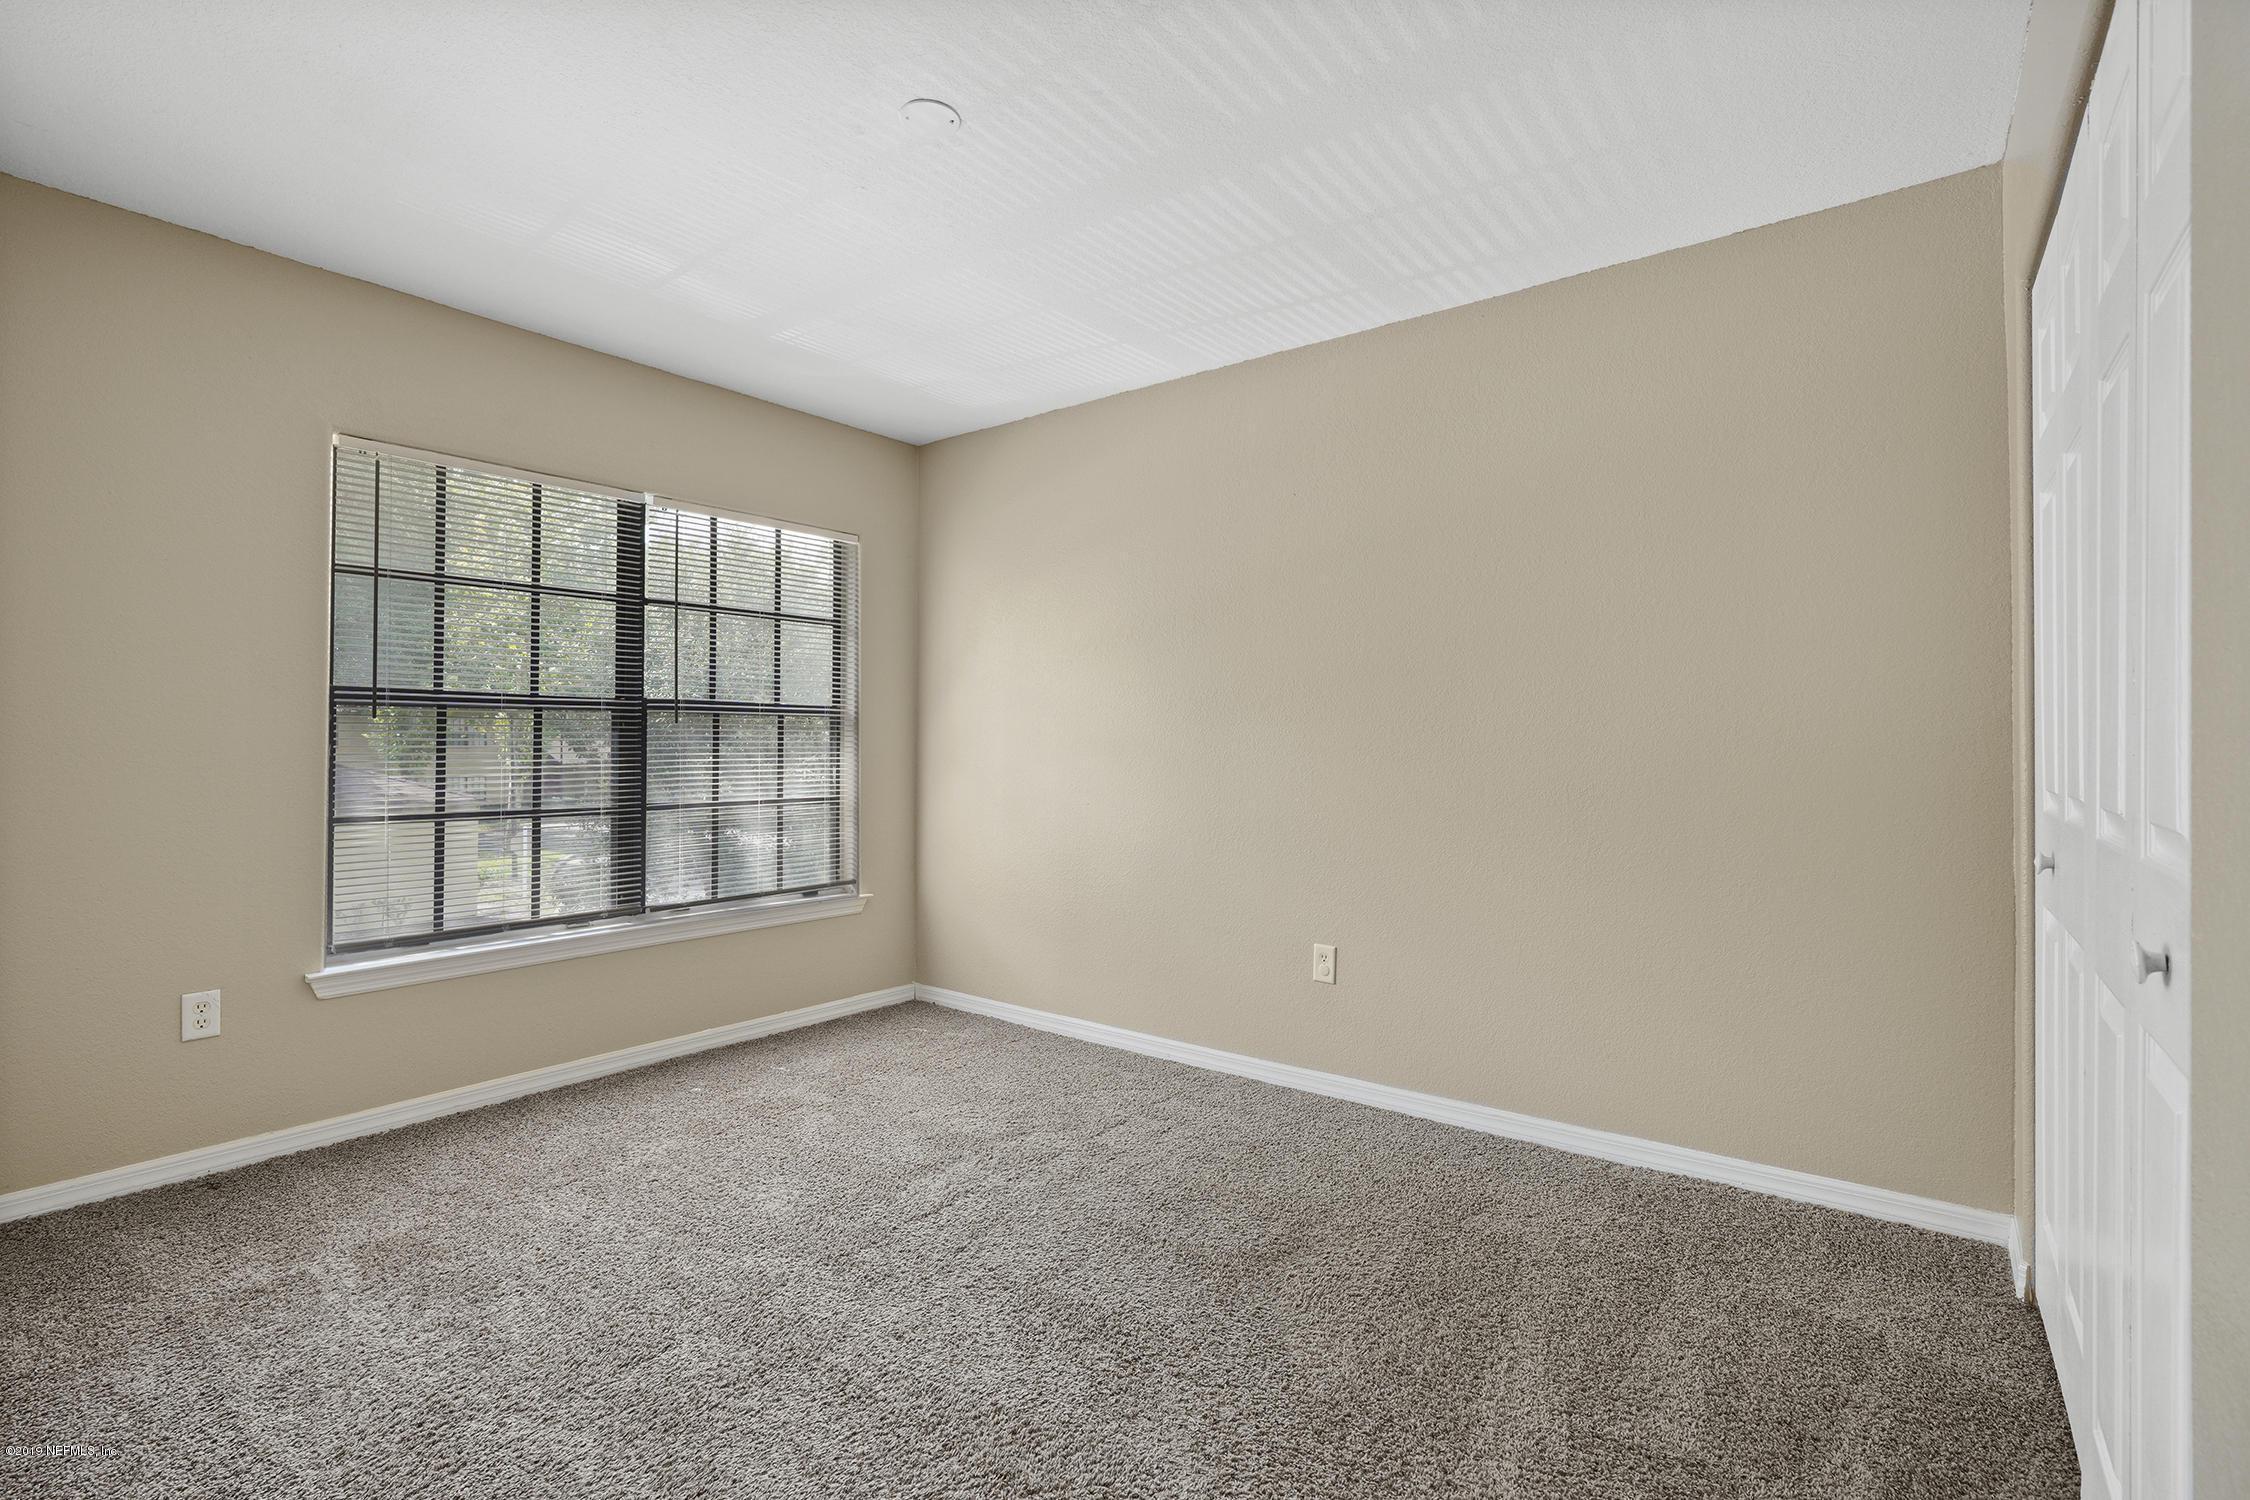 10150 BELLE RIVE, JACKSONVILLE, FLORIDA 32256, 3 Bedrooms Bedrooms, ,2 BathroomsBathrooms,Condo,For sale,BELLE RIVE,1013995